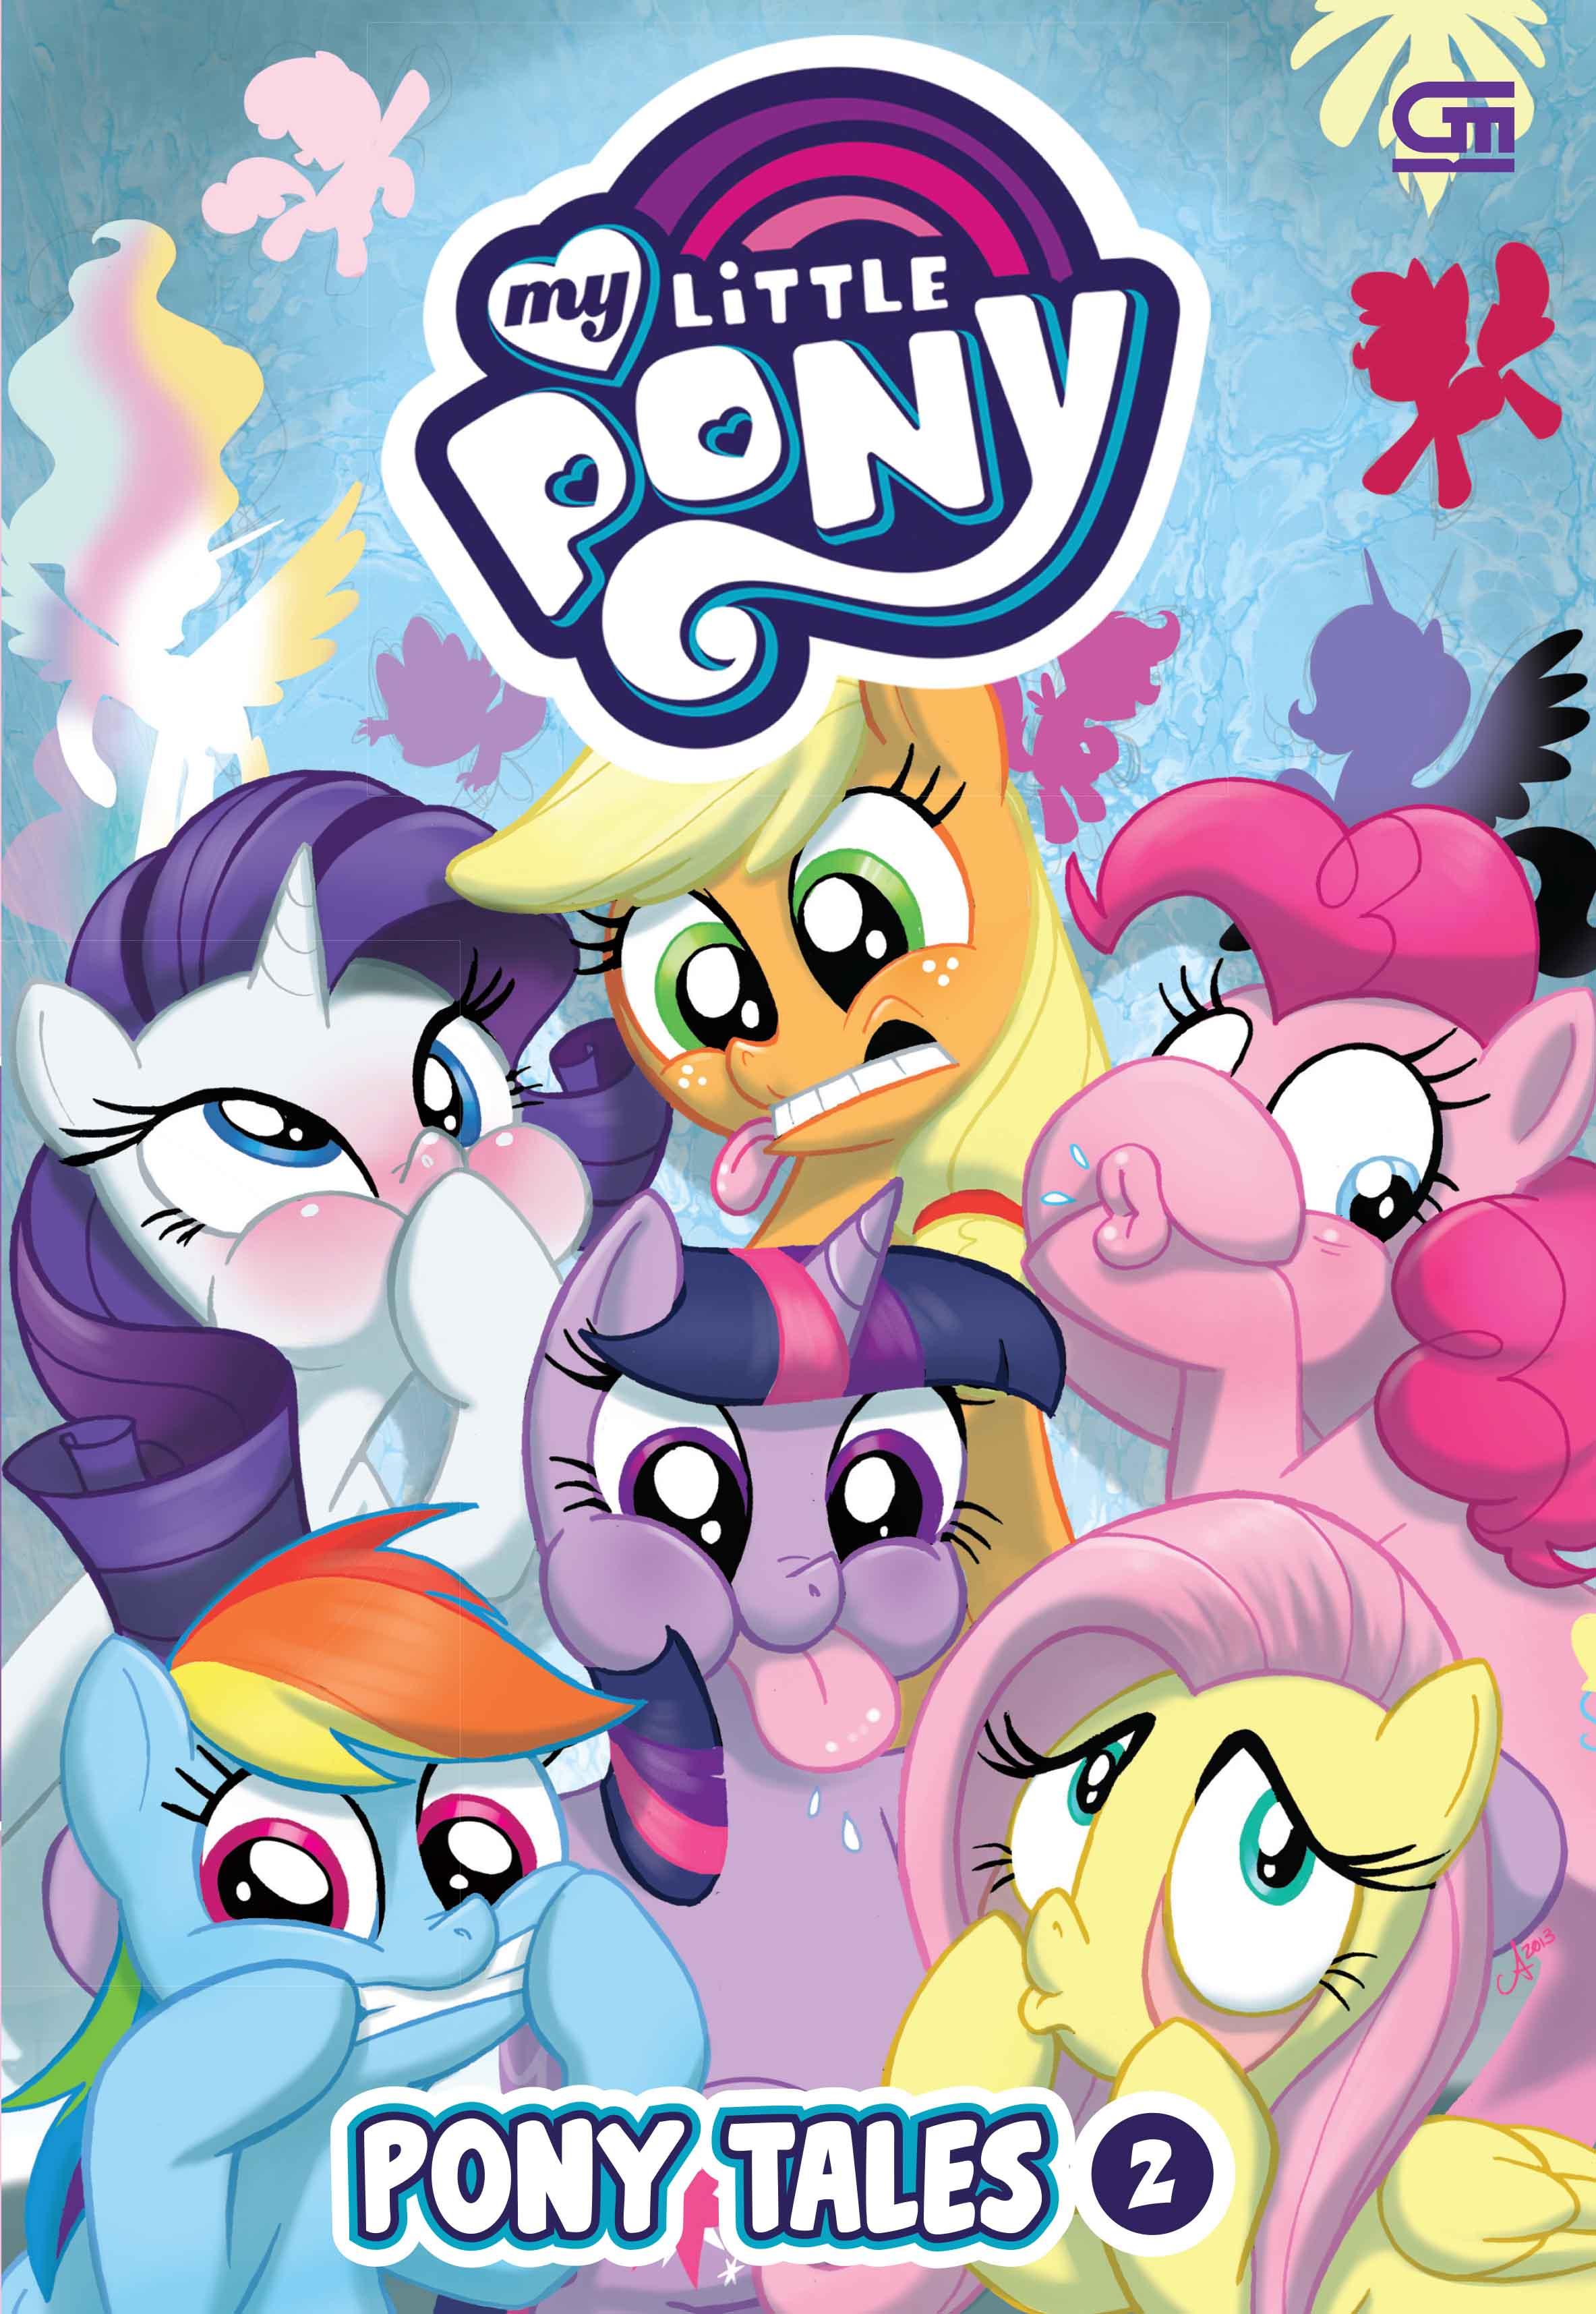 My Little Pony: Pony Tales 2